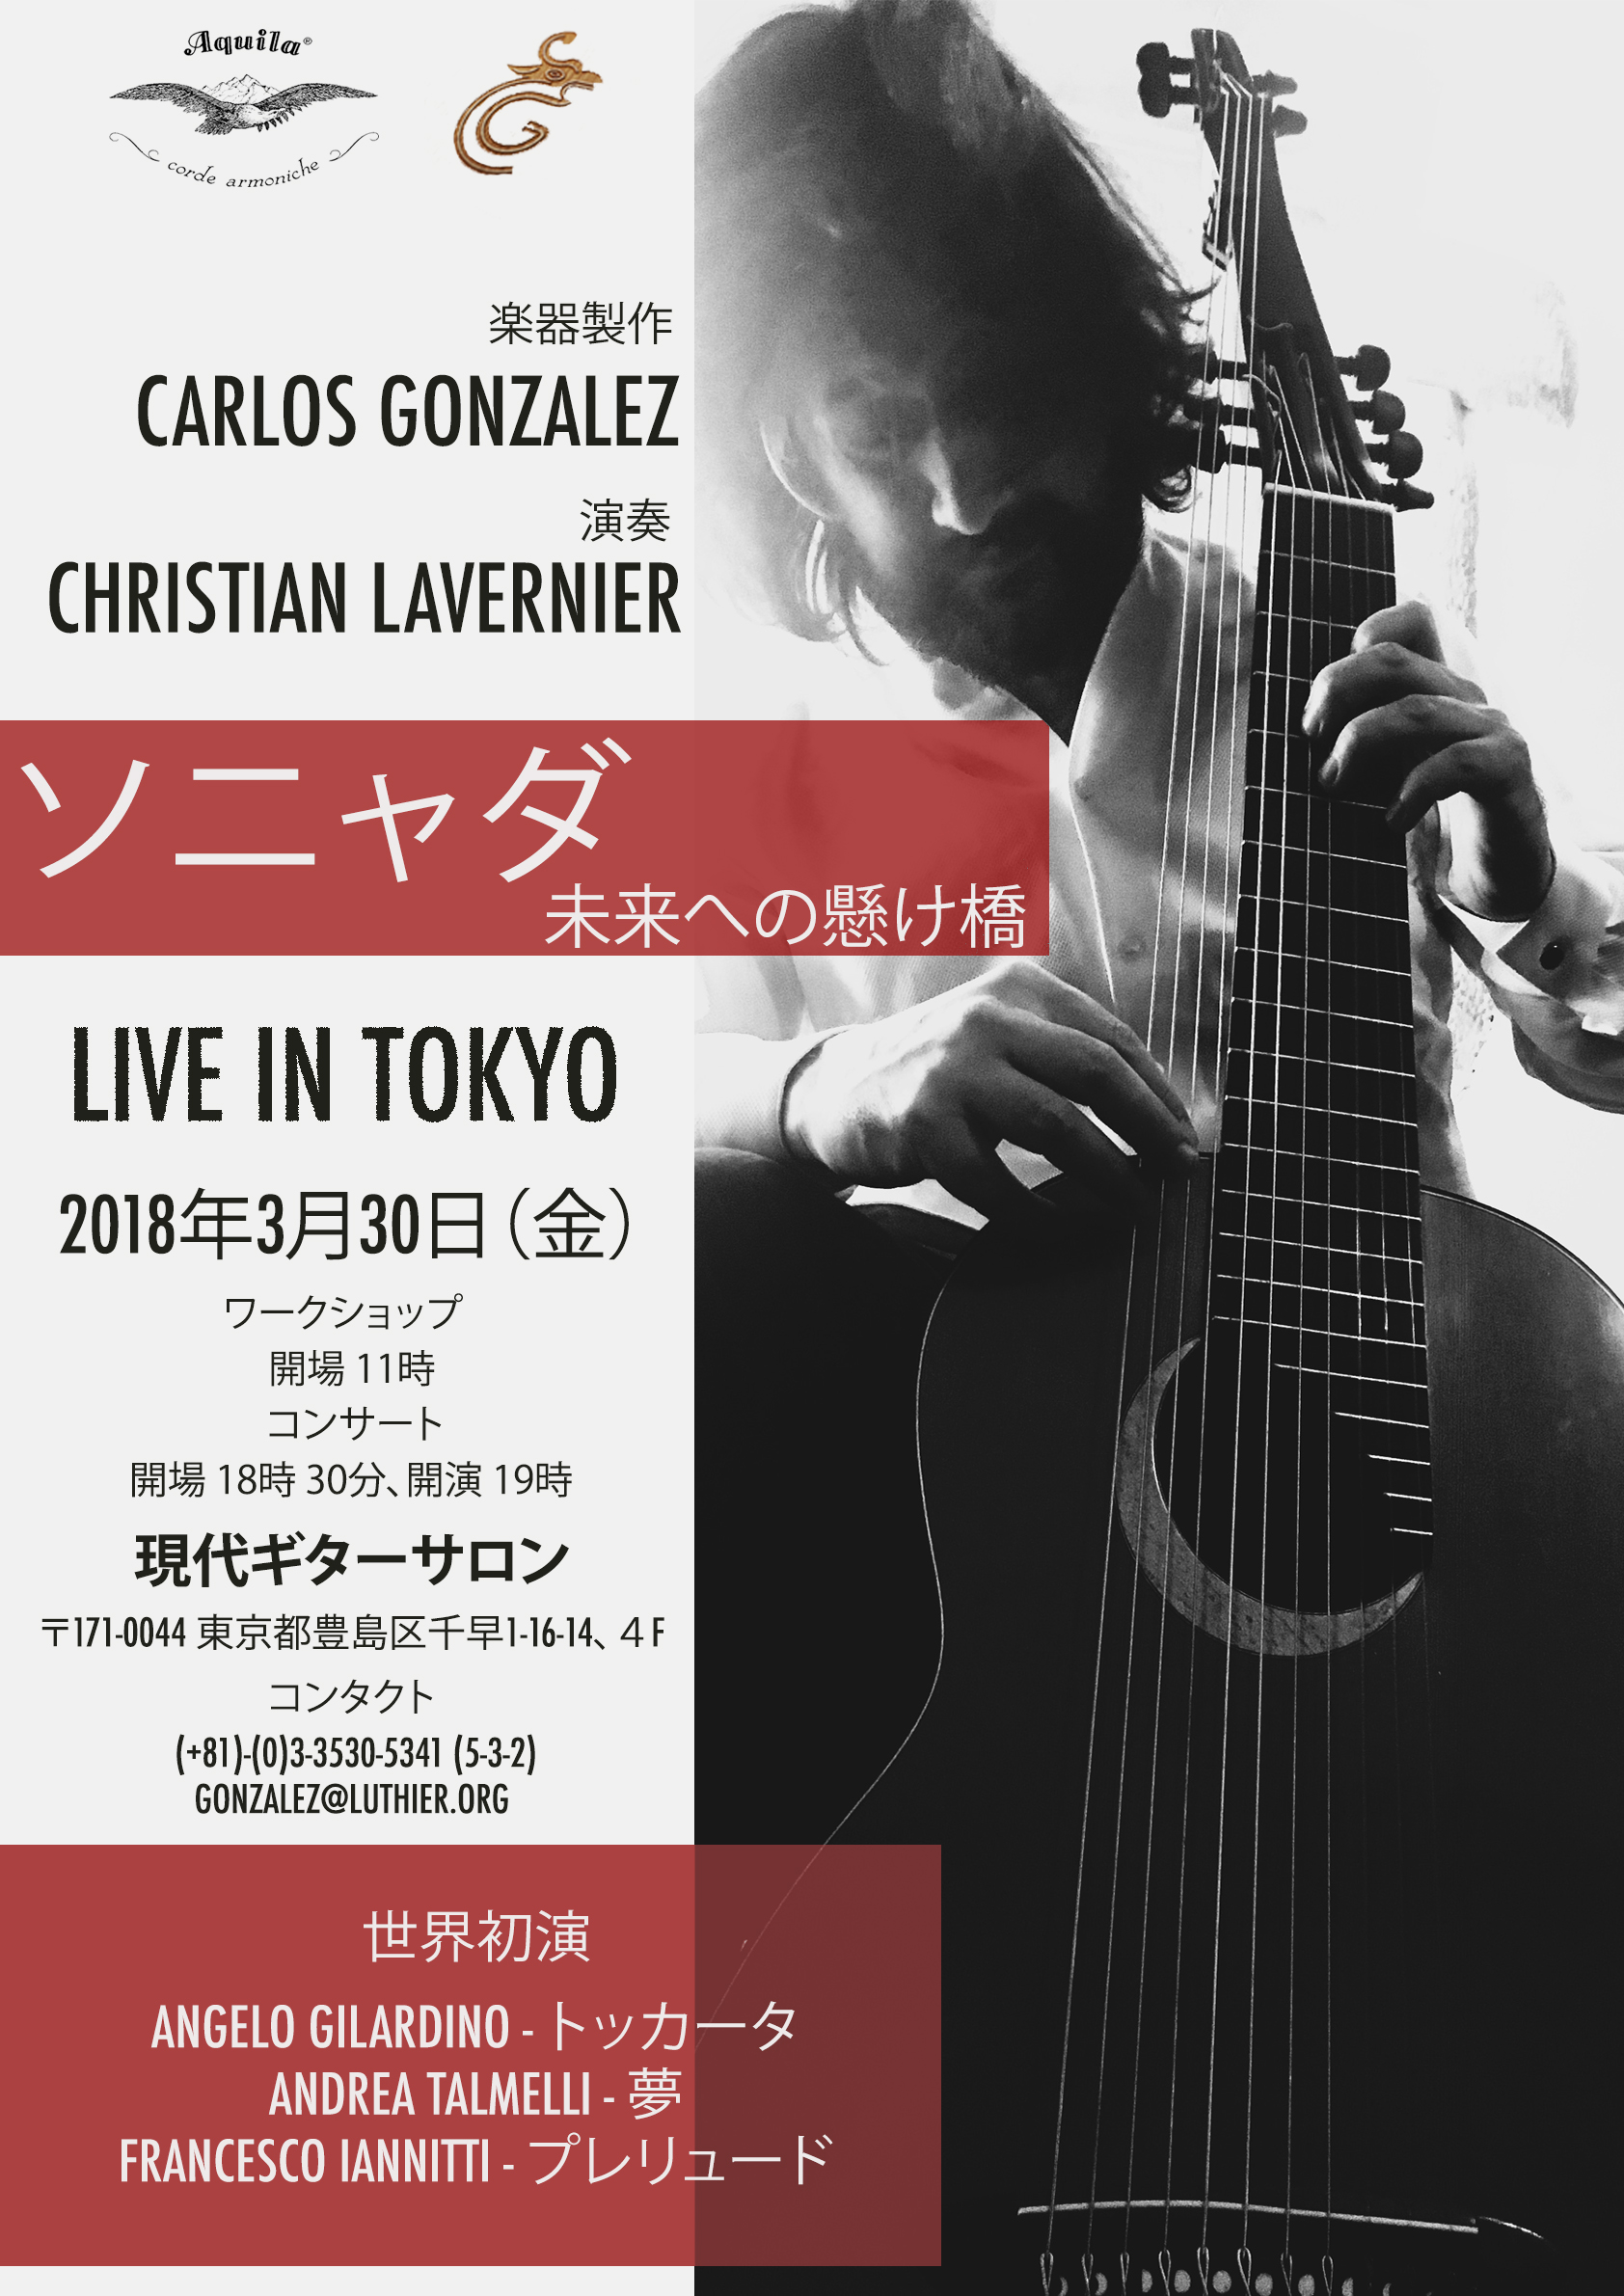 Christian Lavernier Live in Tokto 2018